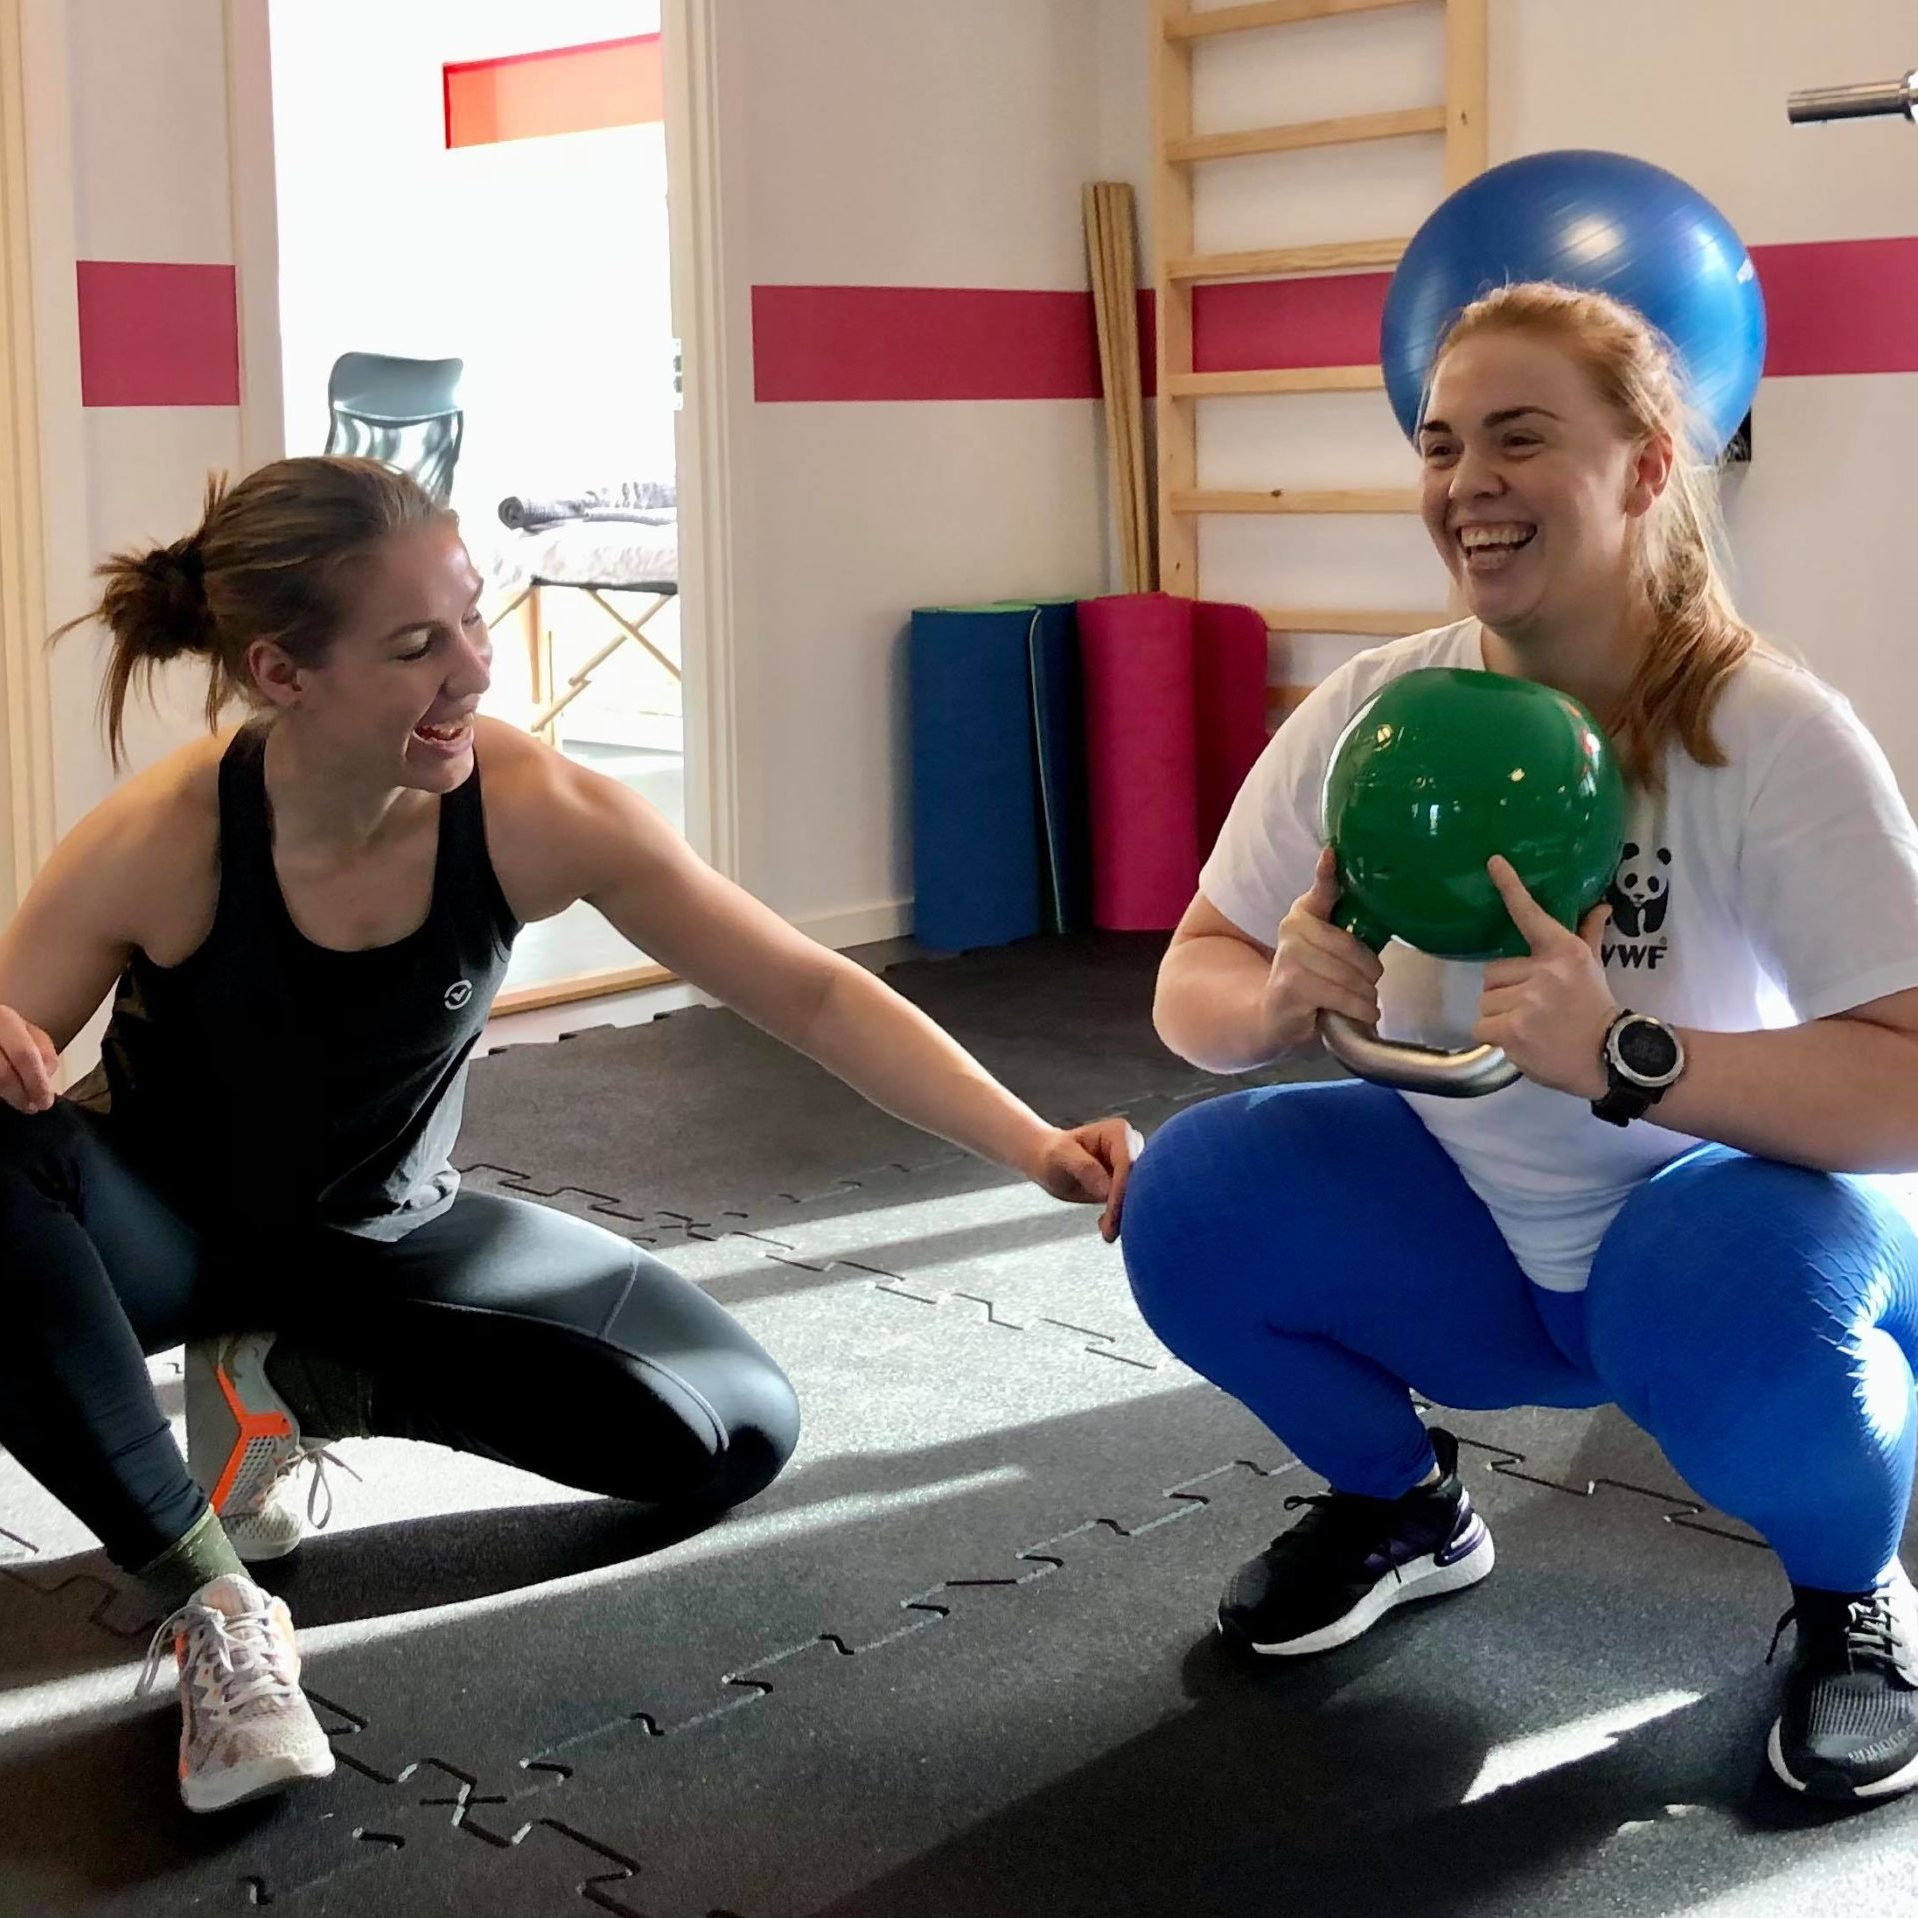 Fysioterapeut Vanløse, Improve Studio, Sofie Ankerstjerne11